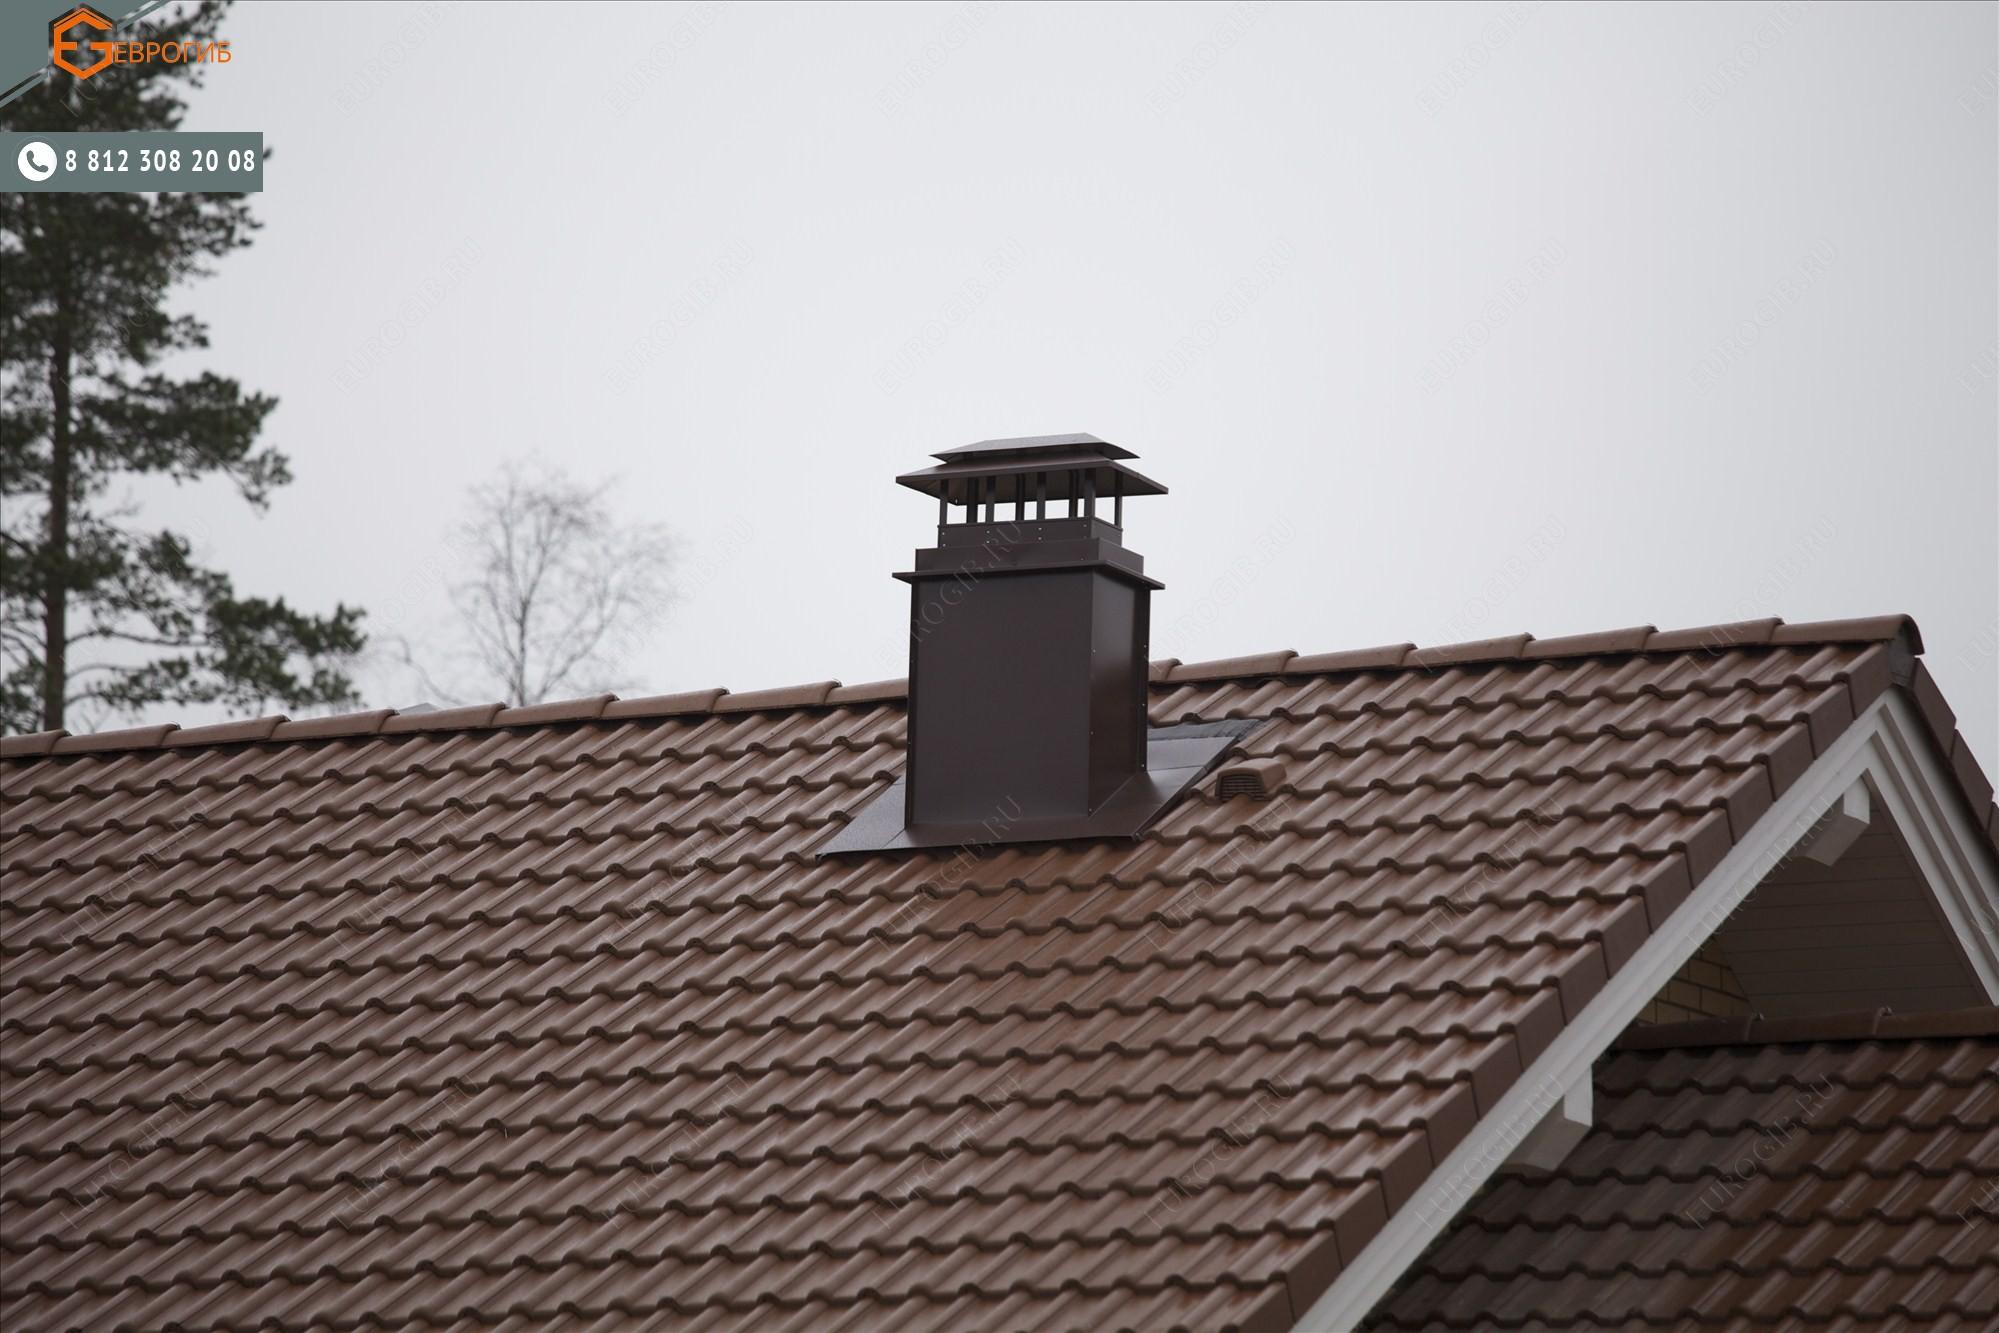 Кожух для трубы на крыше